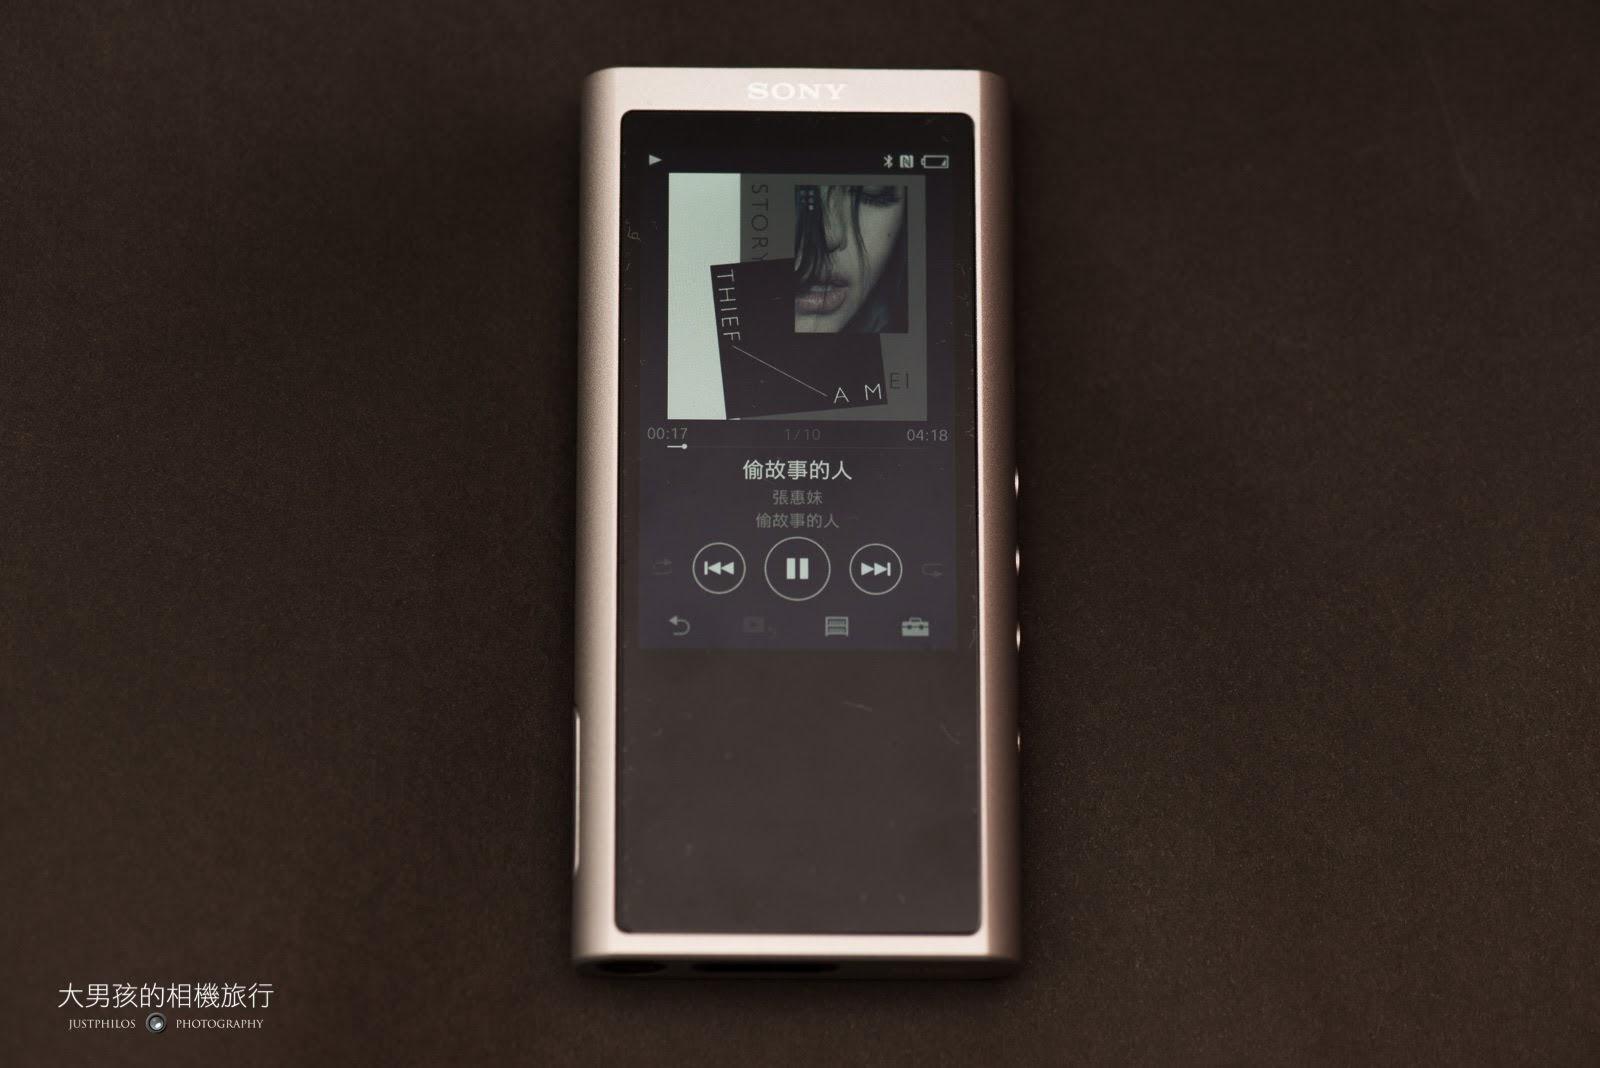 Sony NW-ZX300的歌曲播放介面資訊直覺完整。